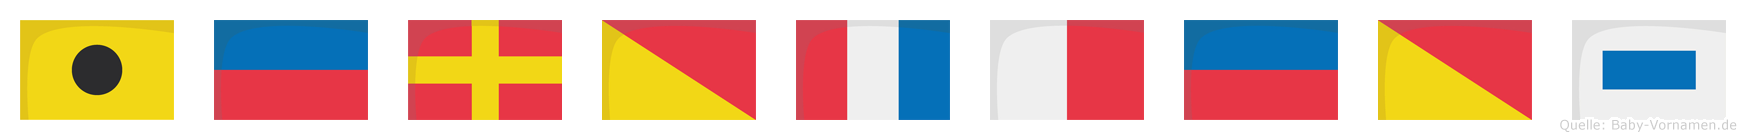 Ierotheos im Flaggenalphabet